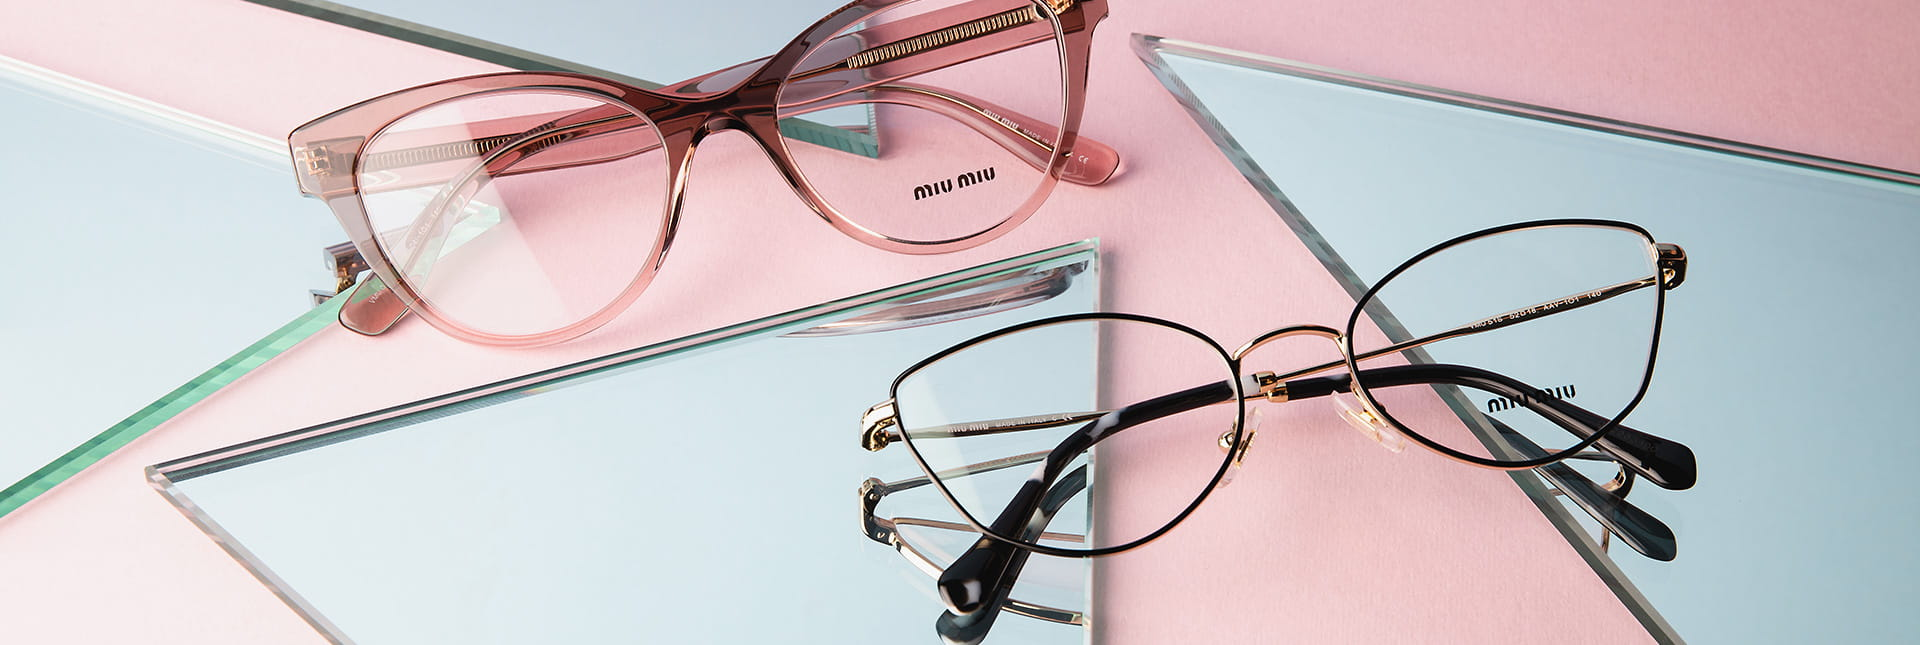 Miu Miu® Eyeglasses